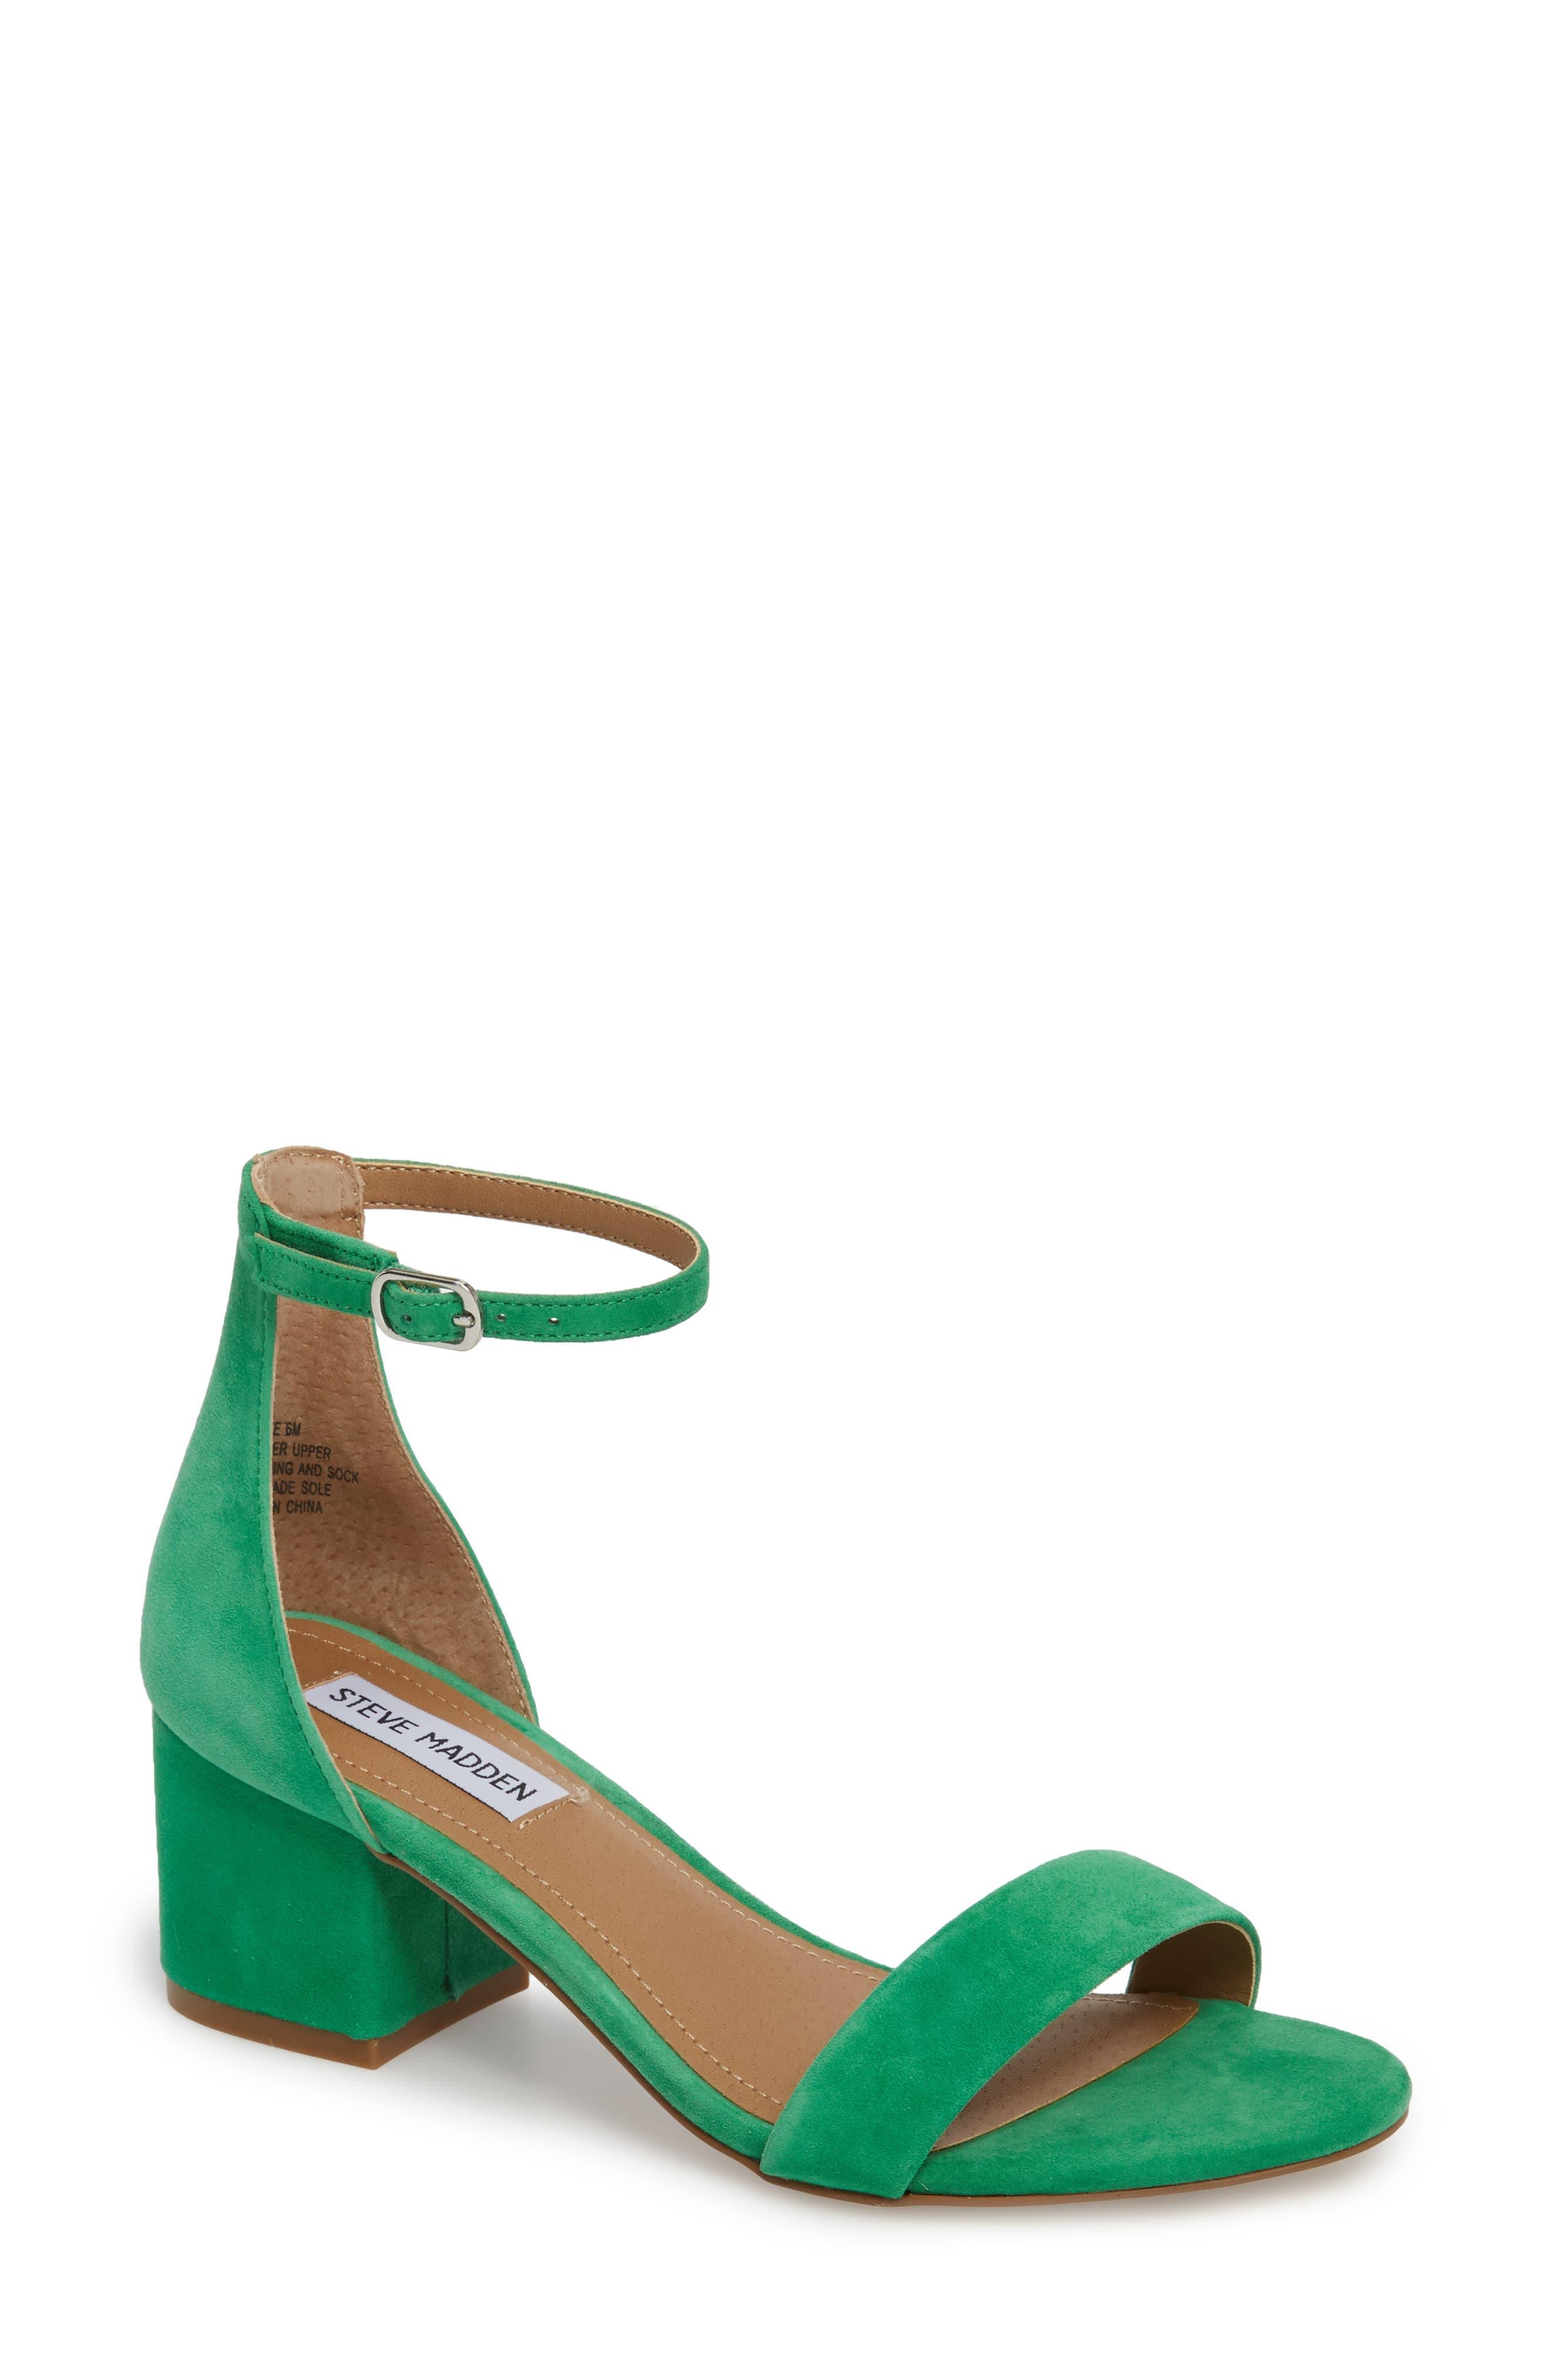 Irenee Ankle Strap Sandal,                             Main thumbnail 7, color,